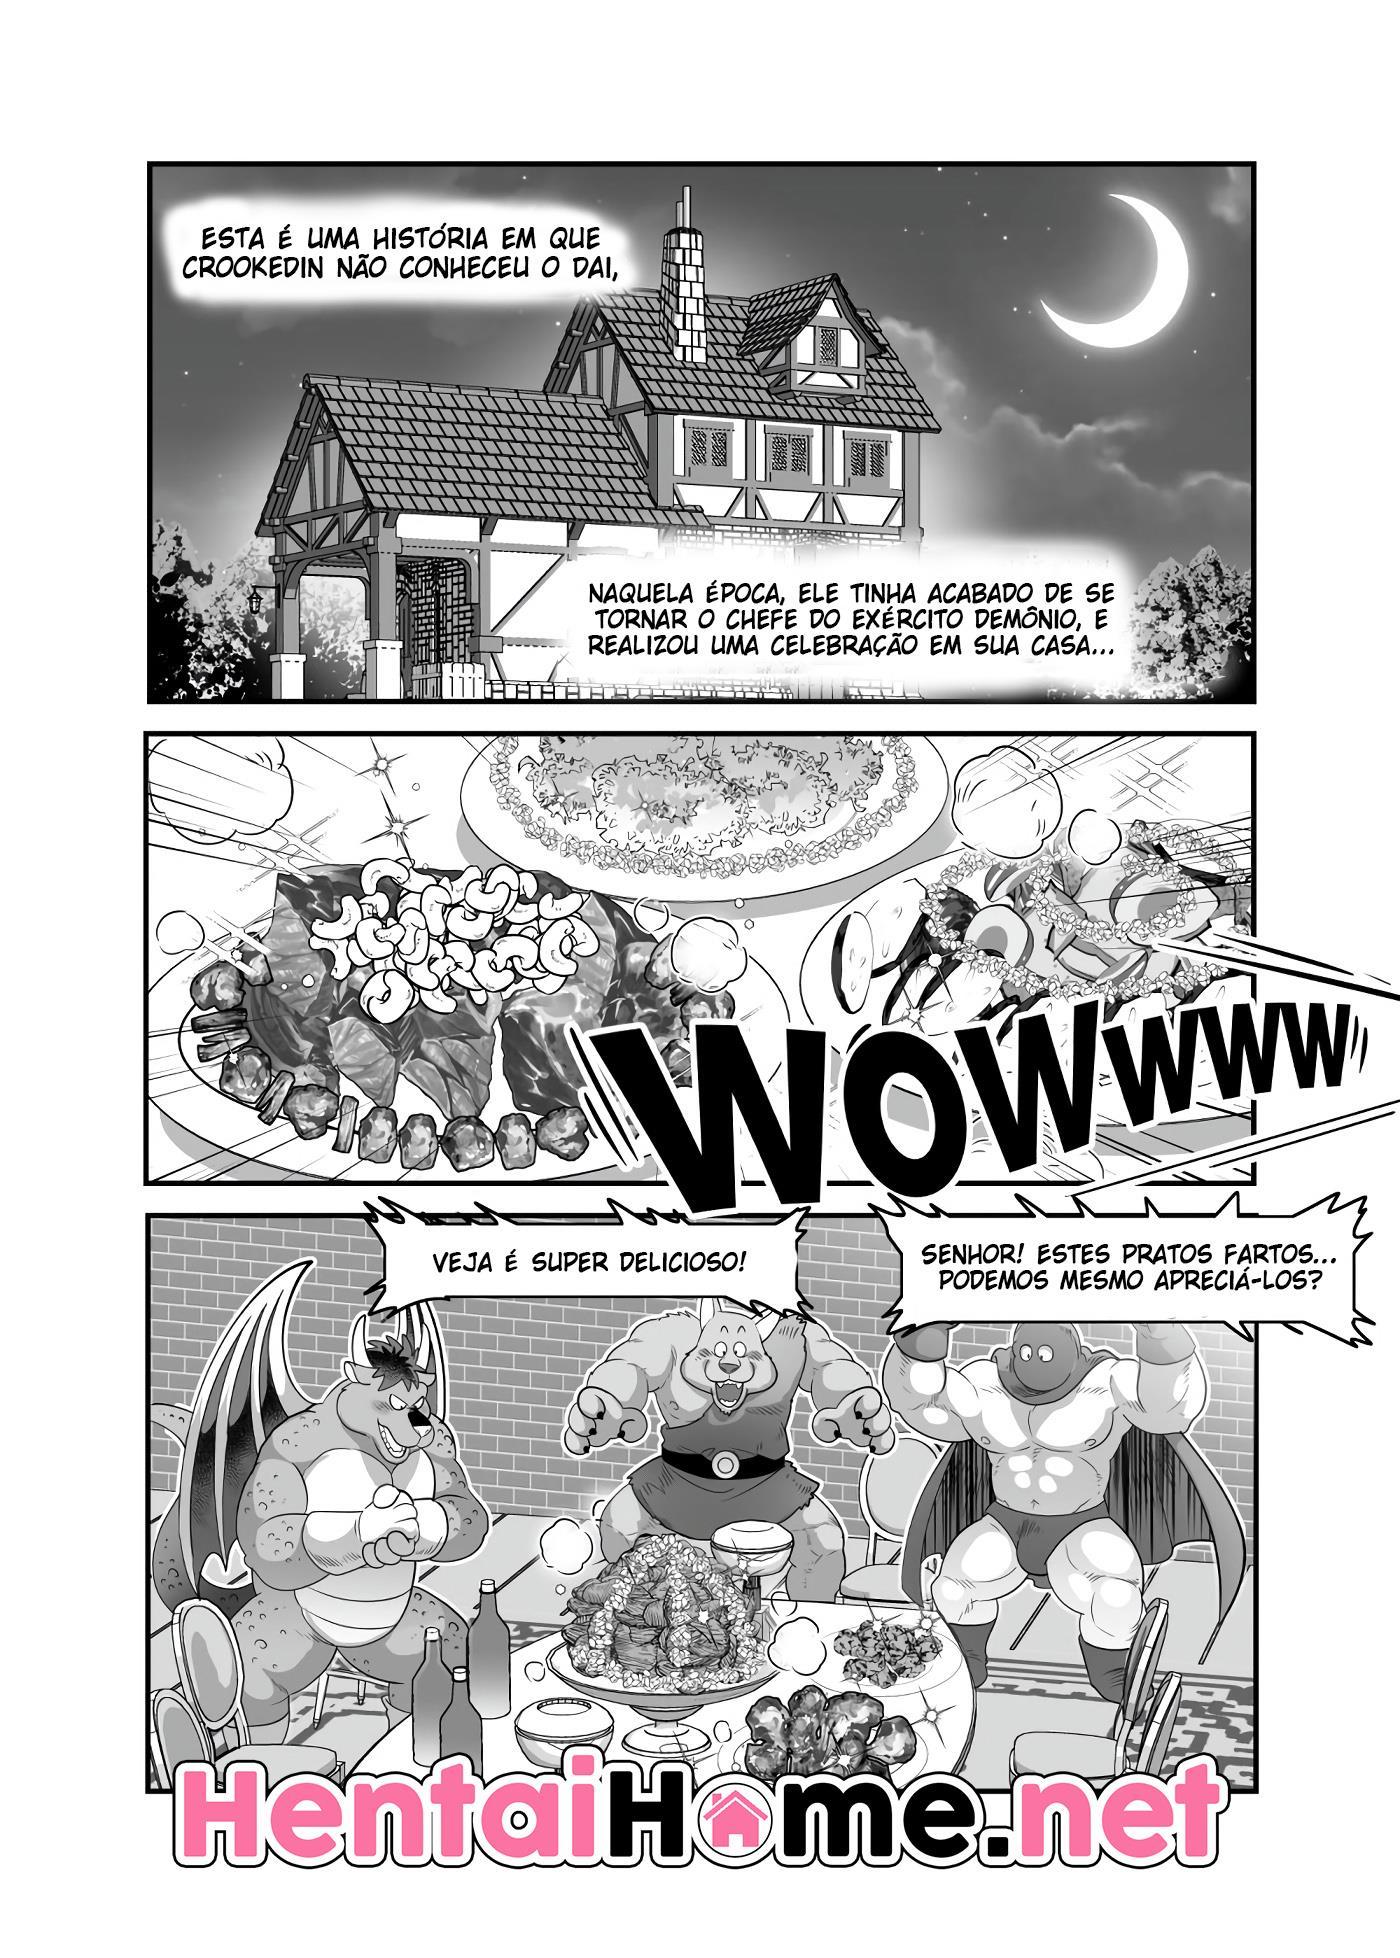 Dragon Quest: Dai no Daiboken Hentai - Crocodine - Foto 3